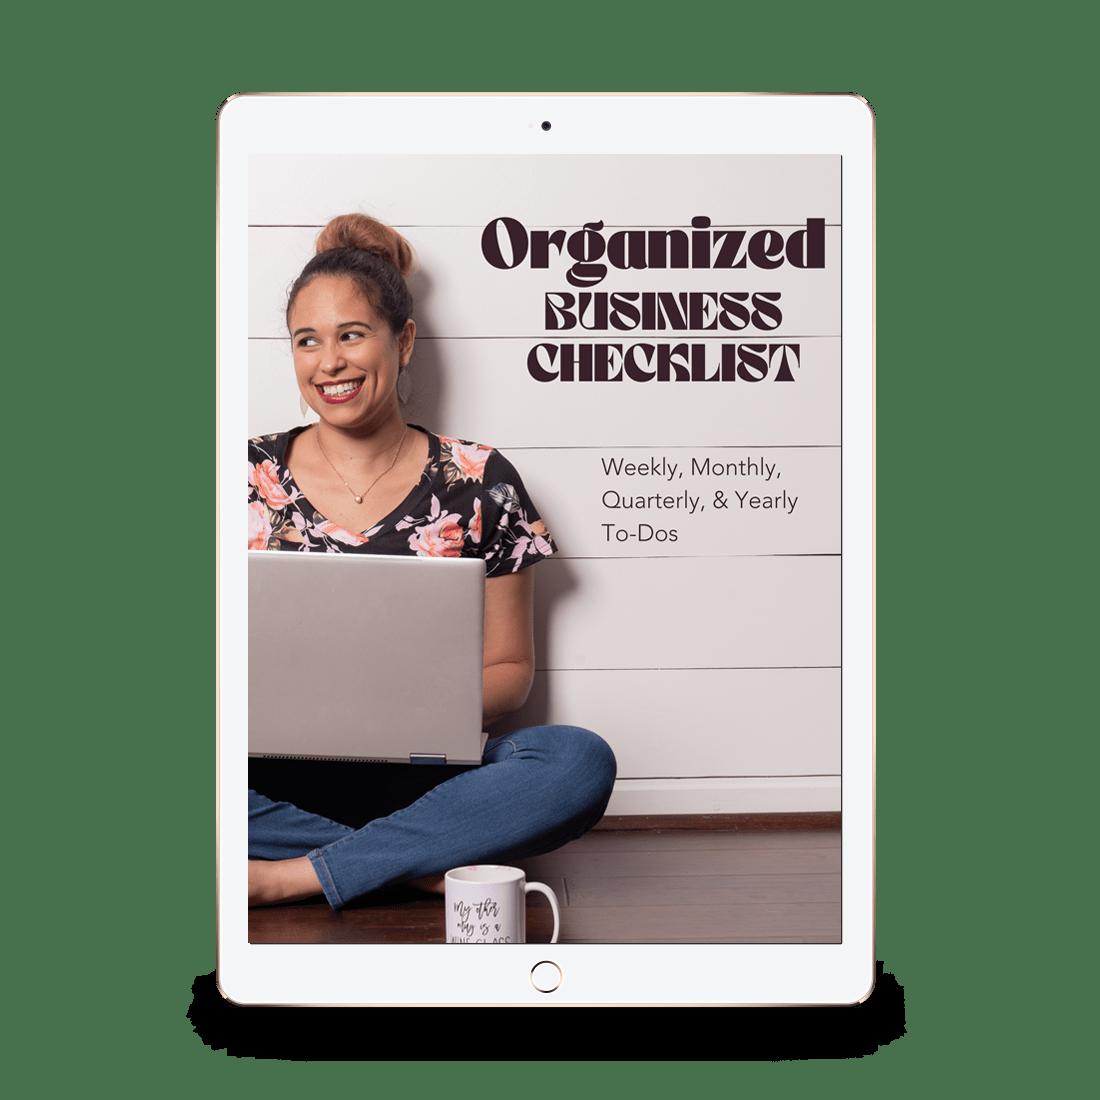 Organized Business Checklist IPad Mockup